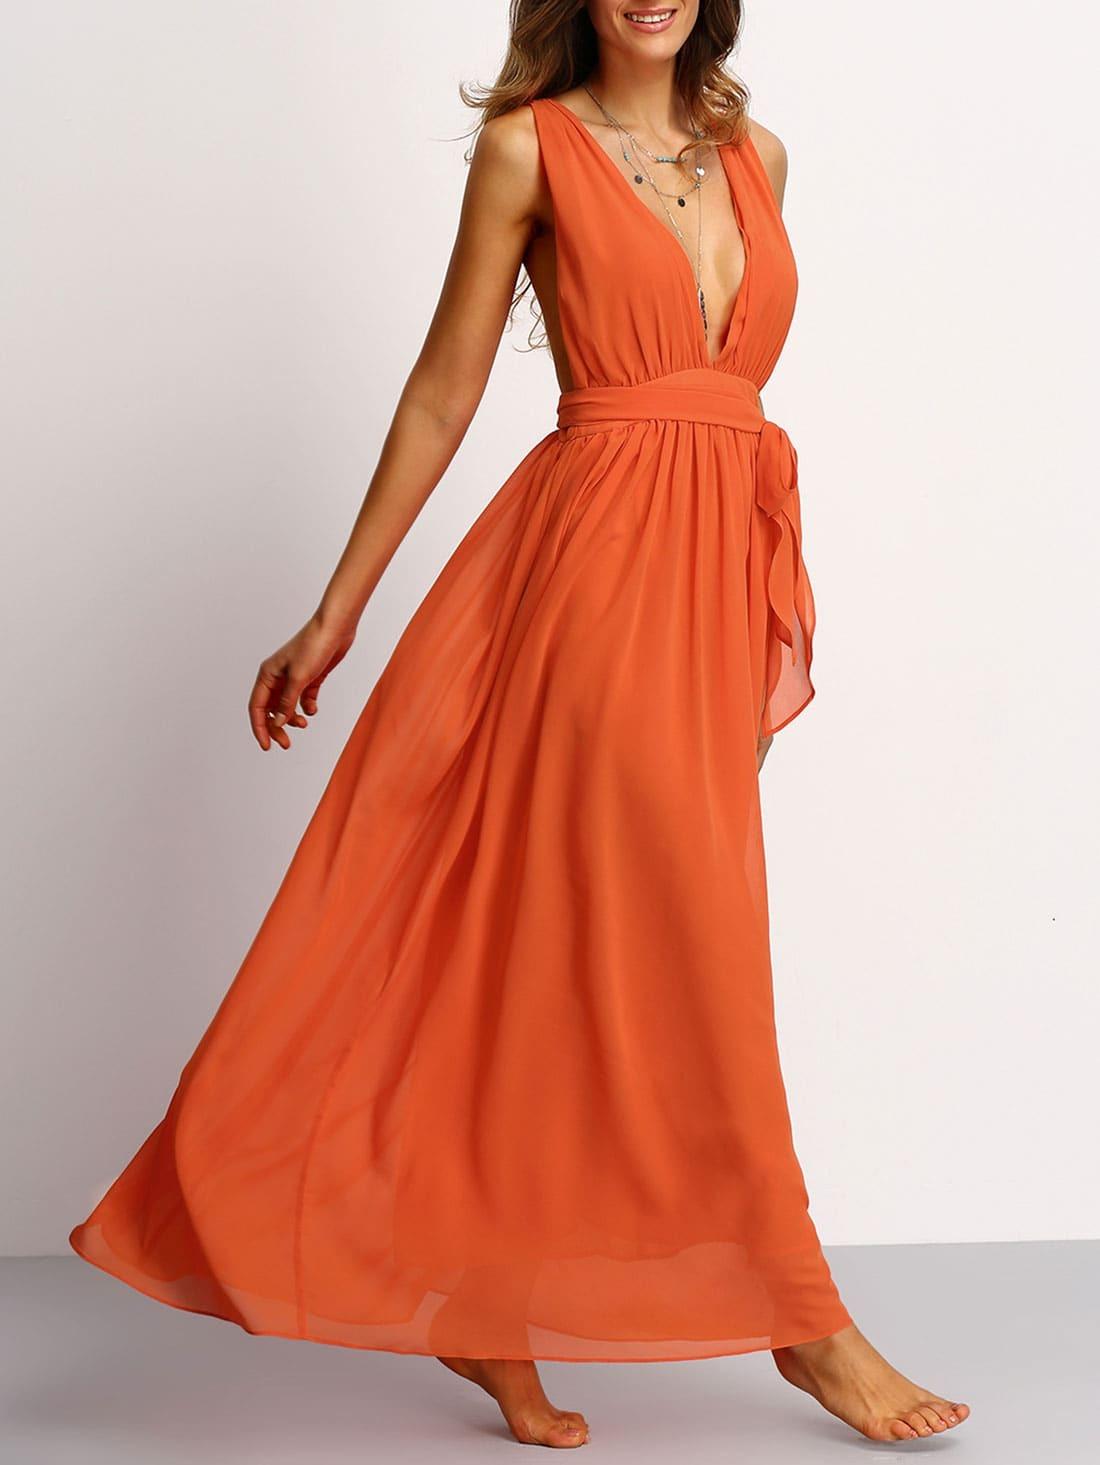 204453ecf7 Orange Deep V Neck Self-tie Waist Maxi Dress EmmaCloth-Women Fast Fashion  Online